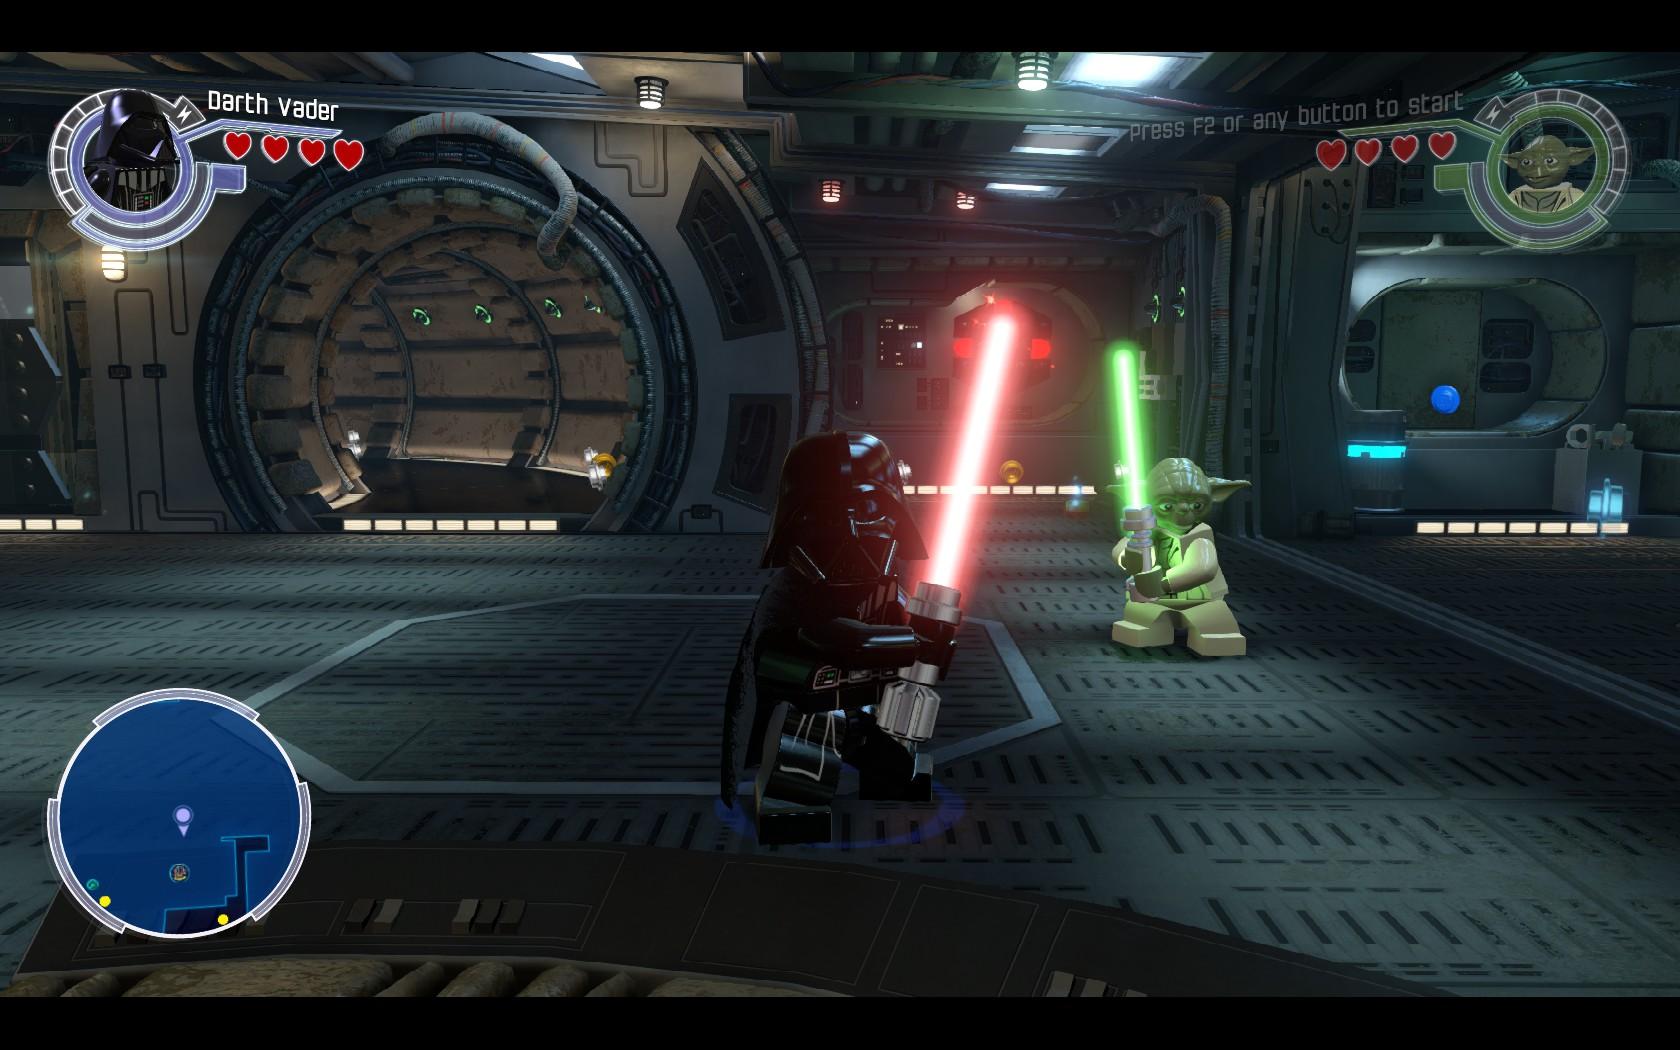 LEGO Star Wars: The Force Awakens - kostky se probouzí 126760